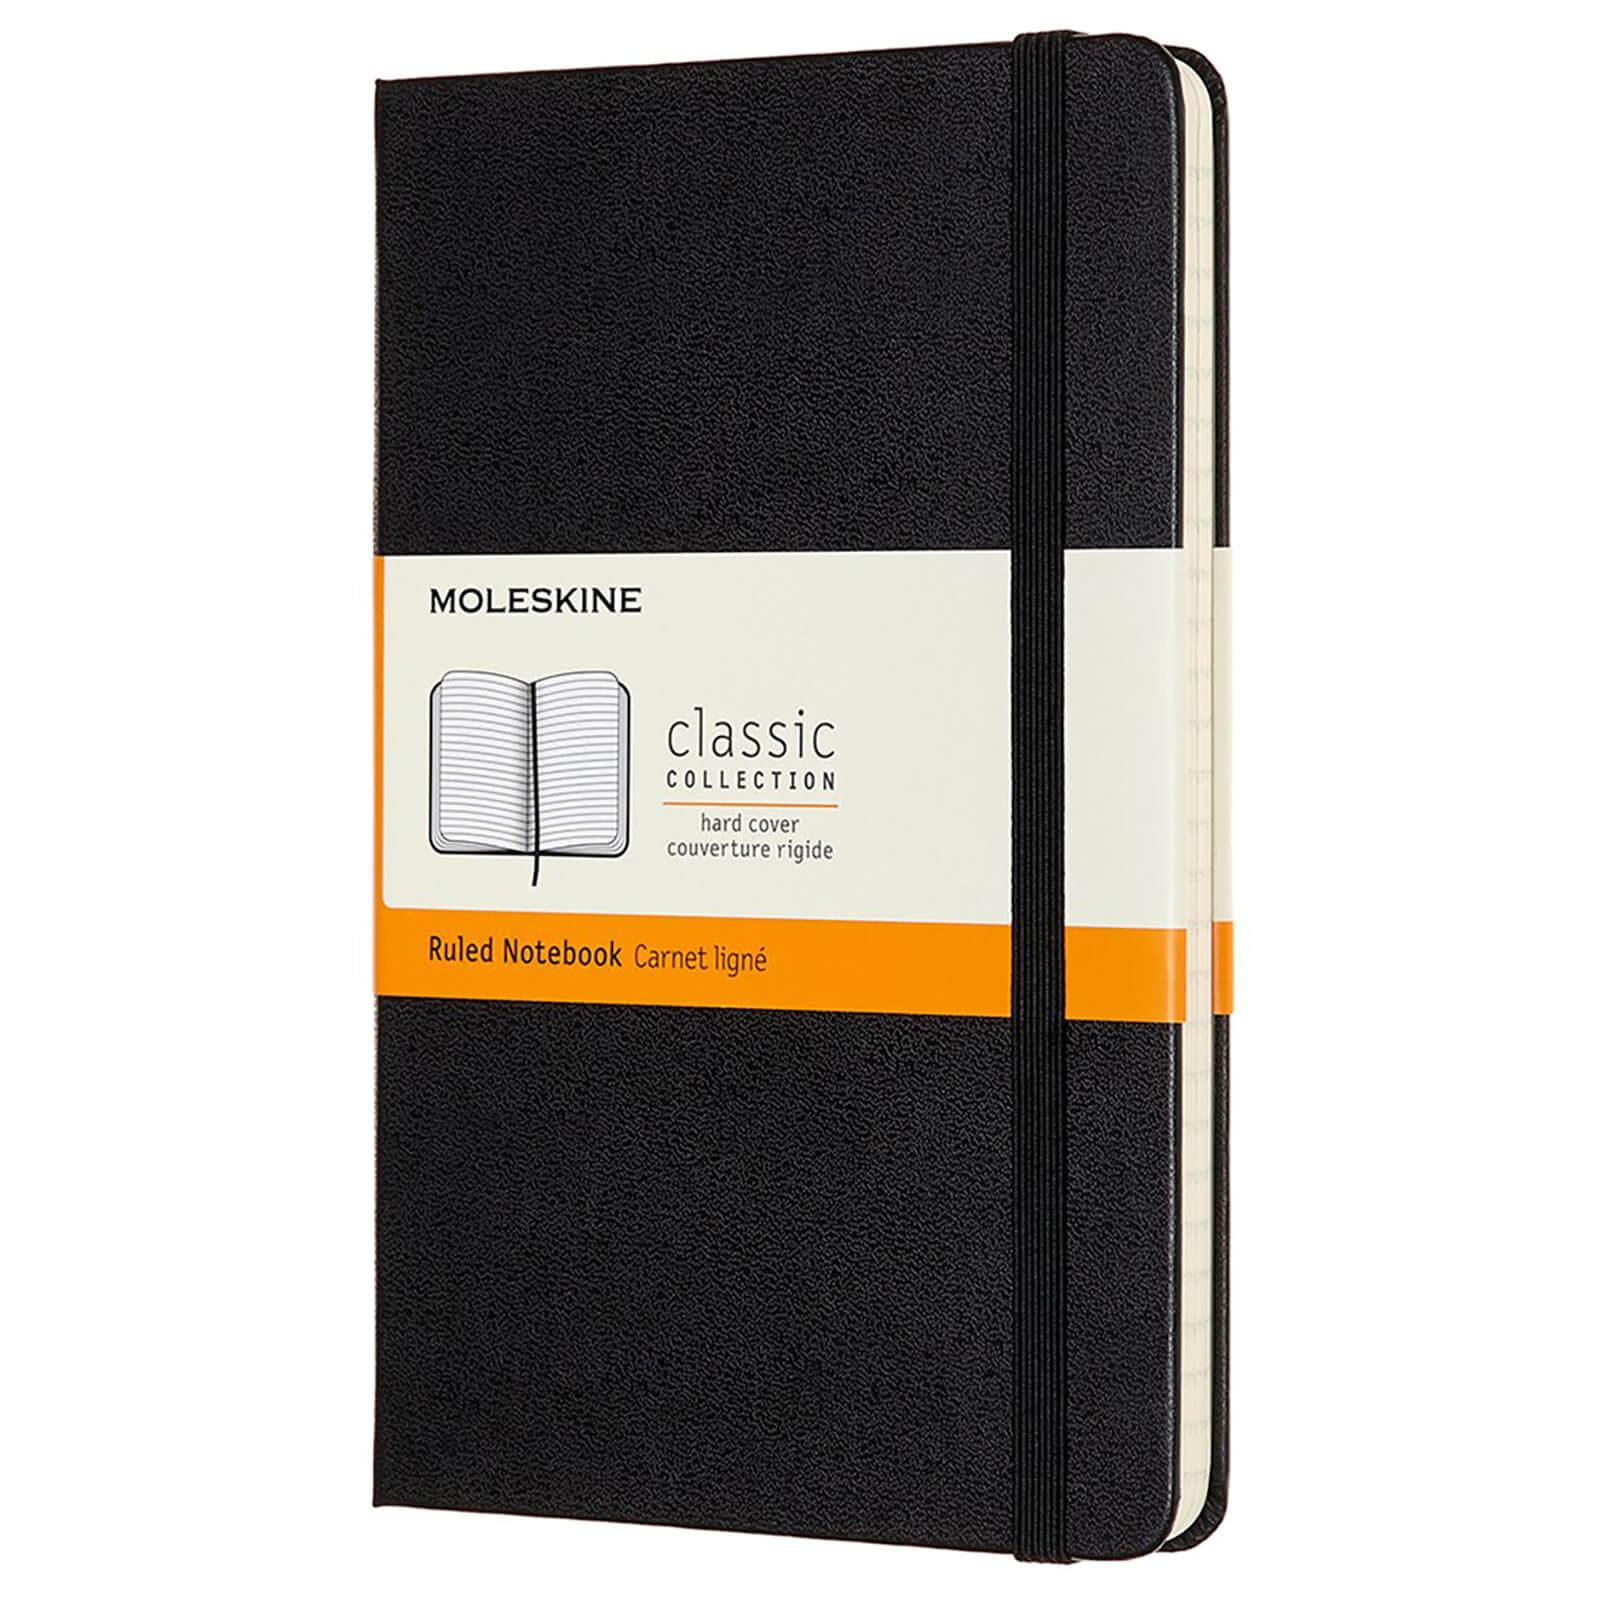 Moleskine Classic Ruled Hardcover Medium Notebook - Black